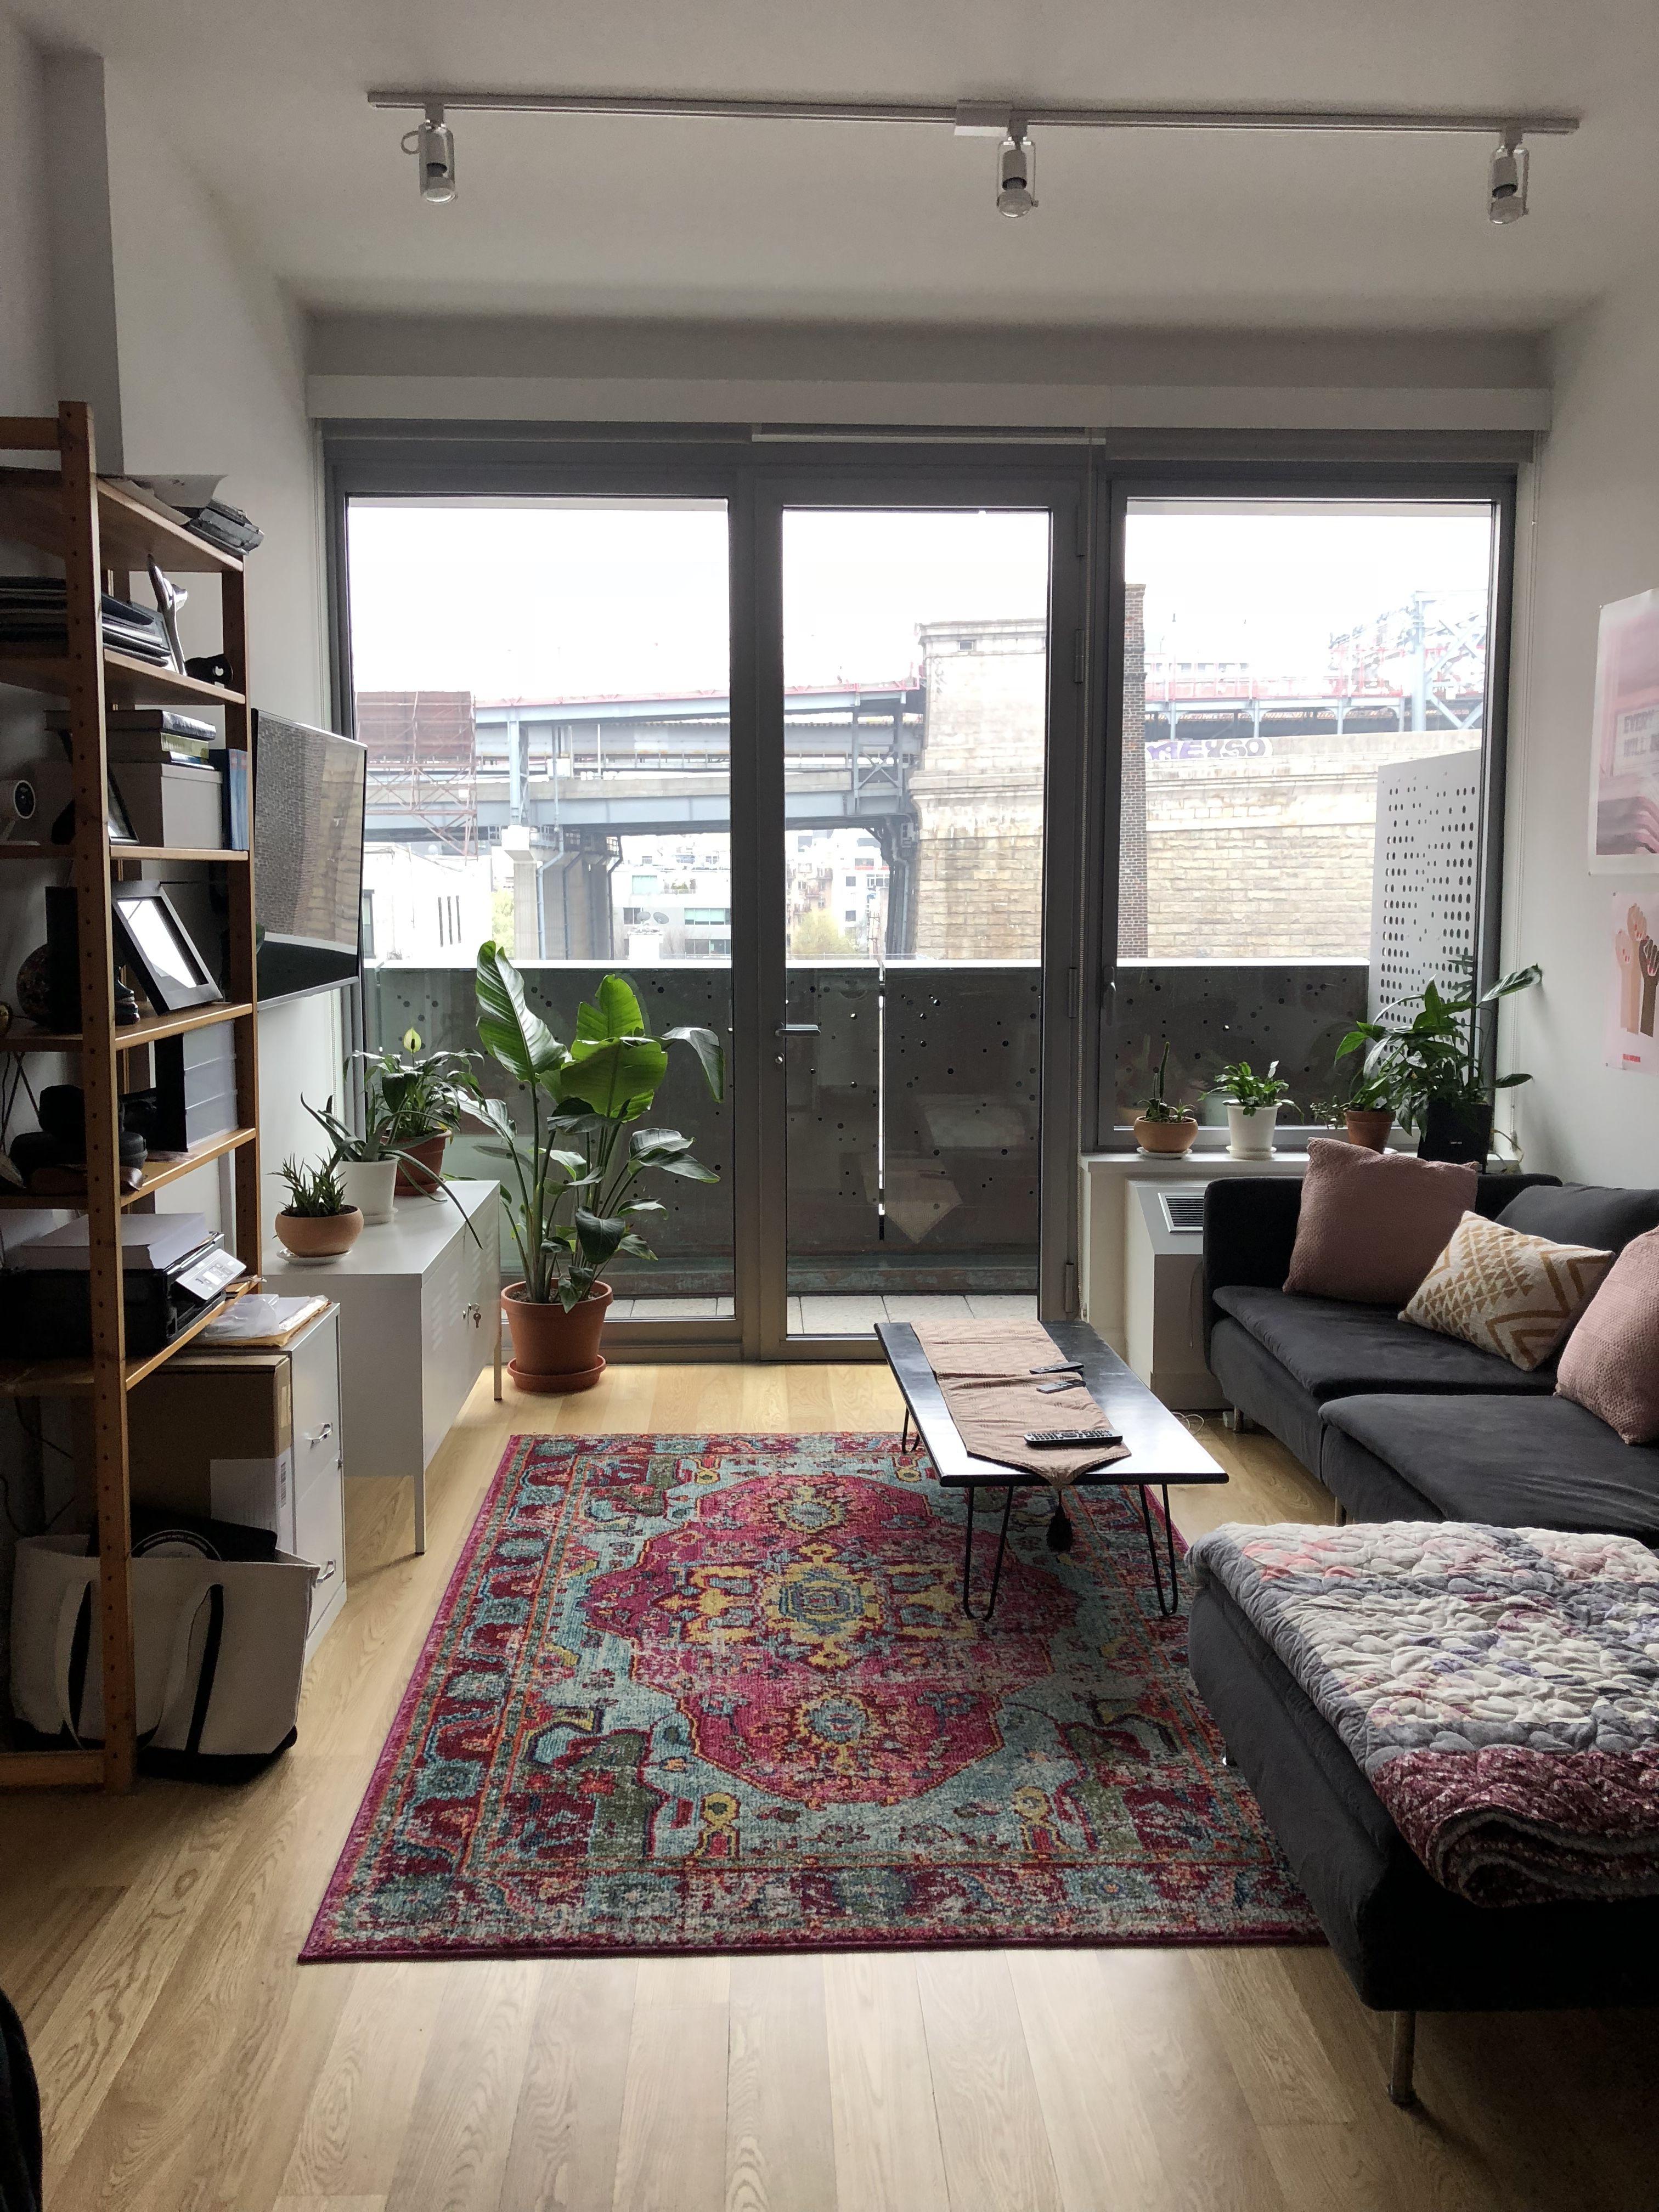 A Boho Minimalist Plant Lady's Brooklyn Rental   Home ...